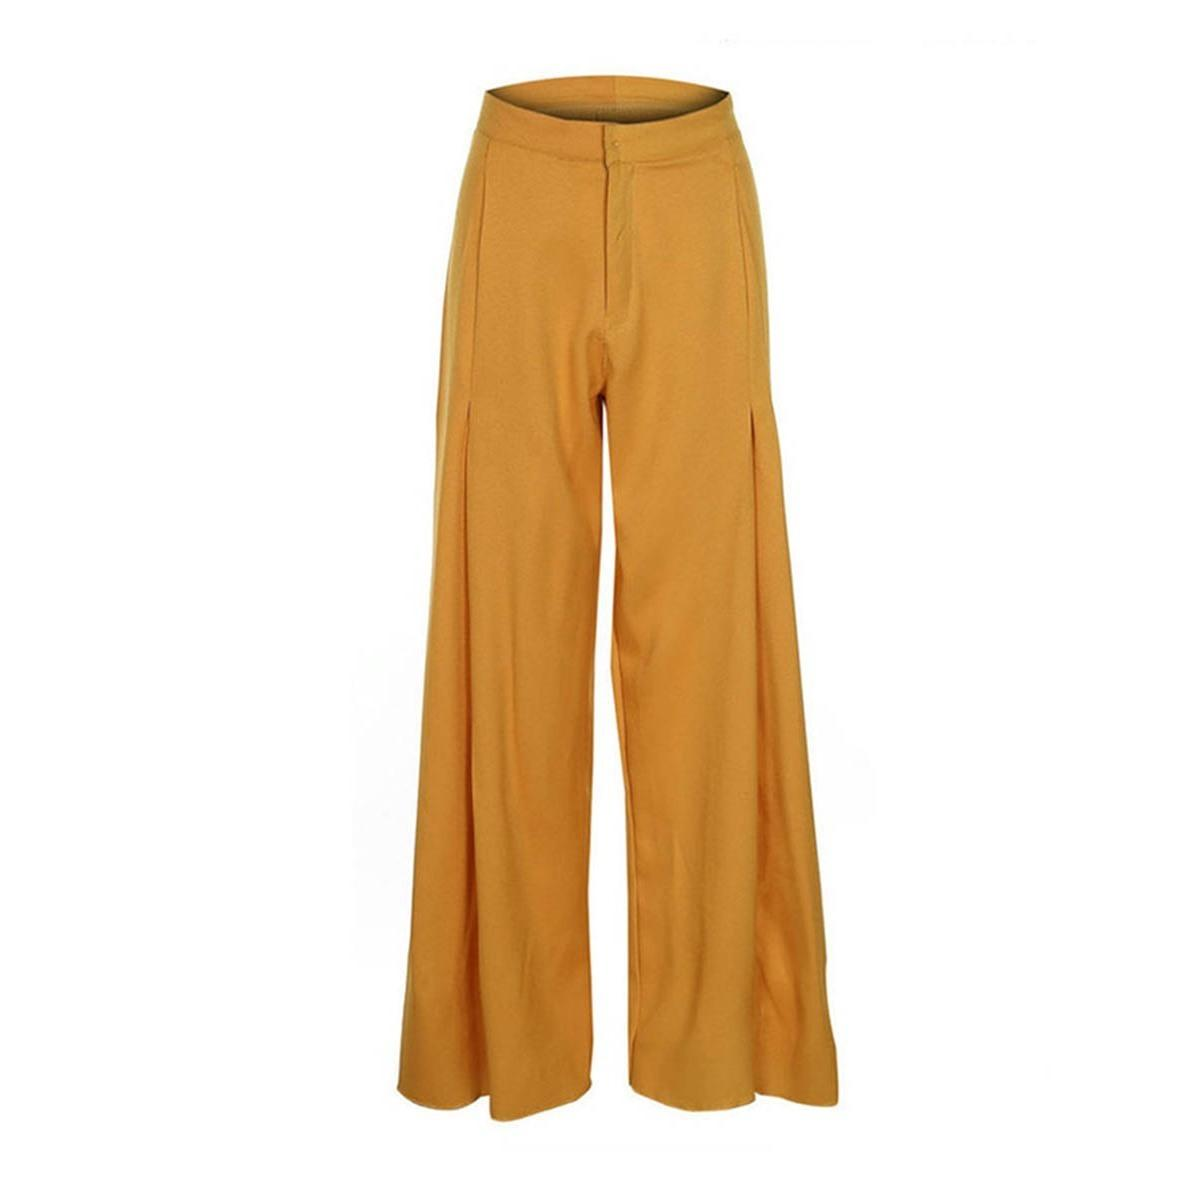 651e018354ea 2019 Young17 Autumn 2019 Women Pants Casual Yellow Streetwear Plus ...